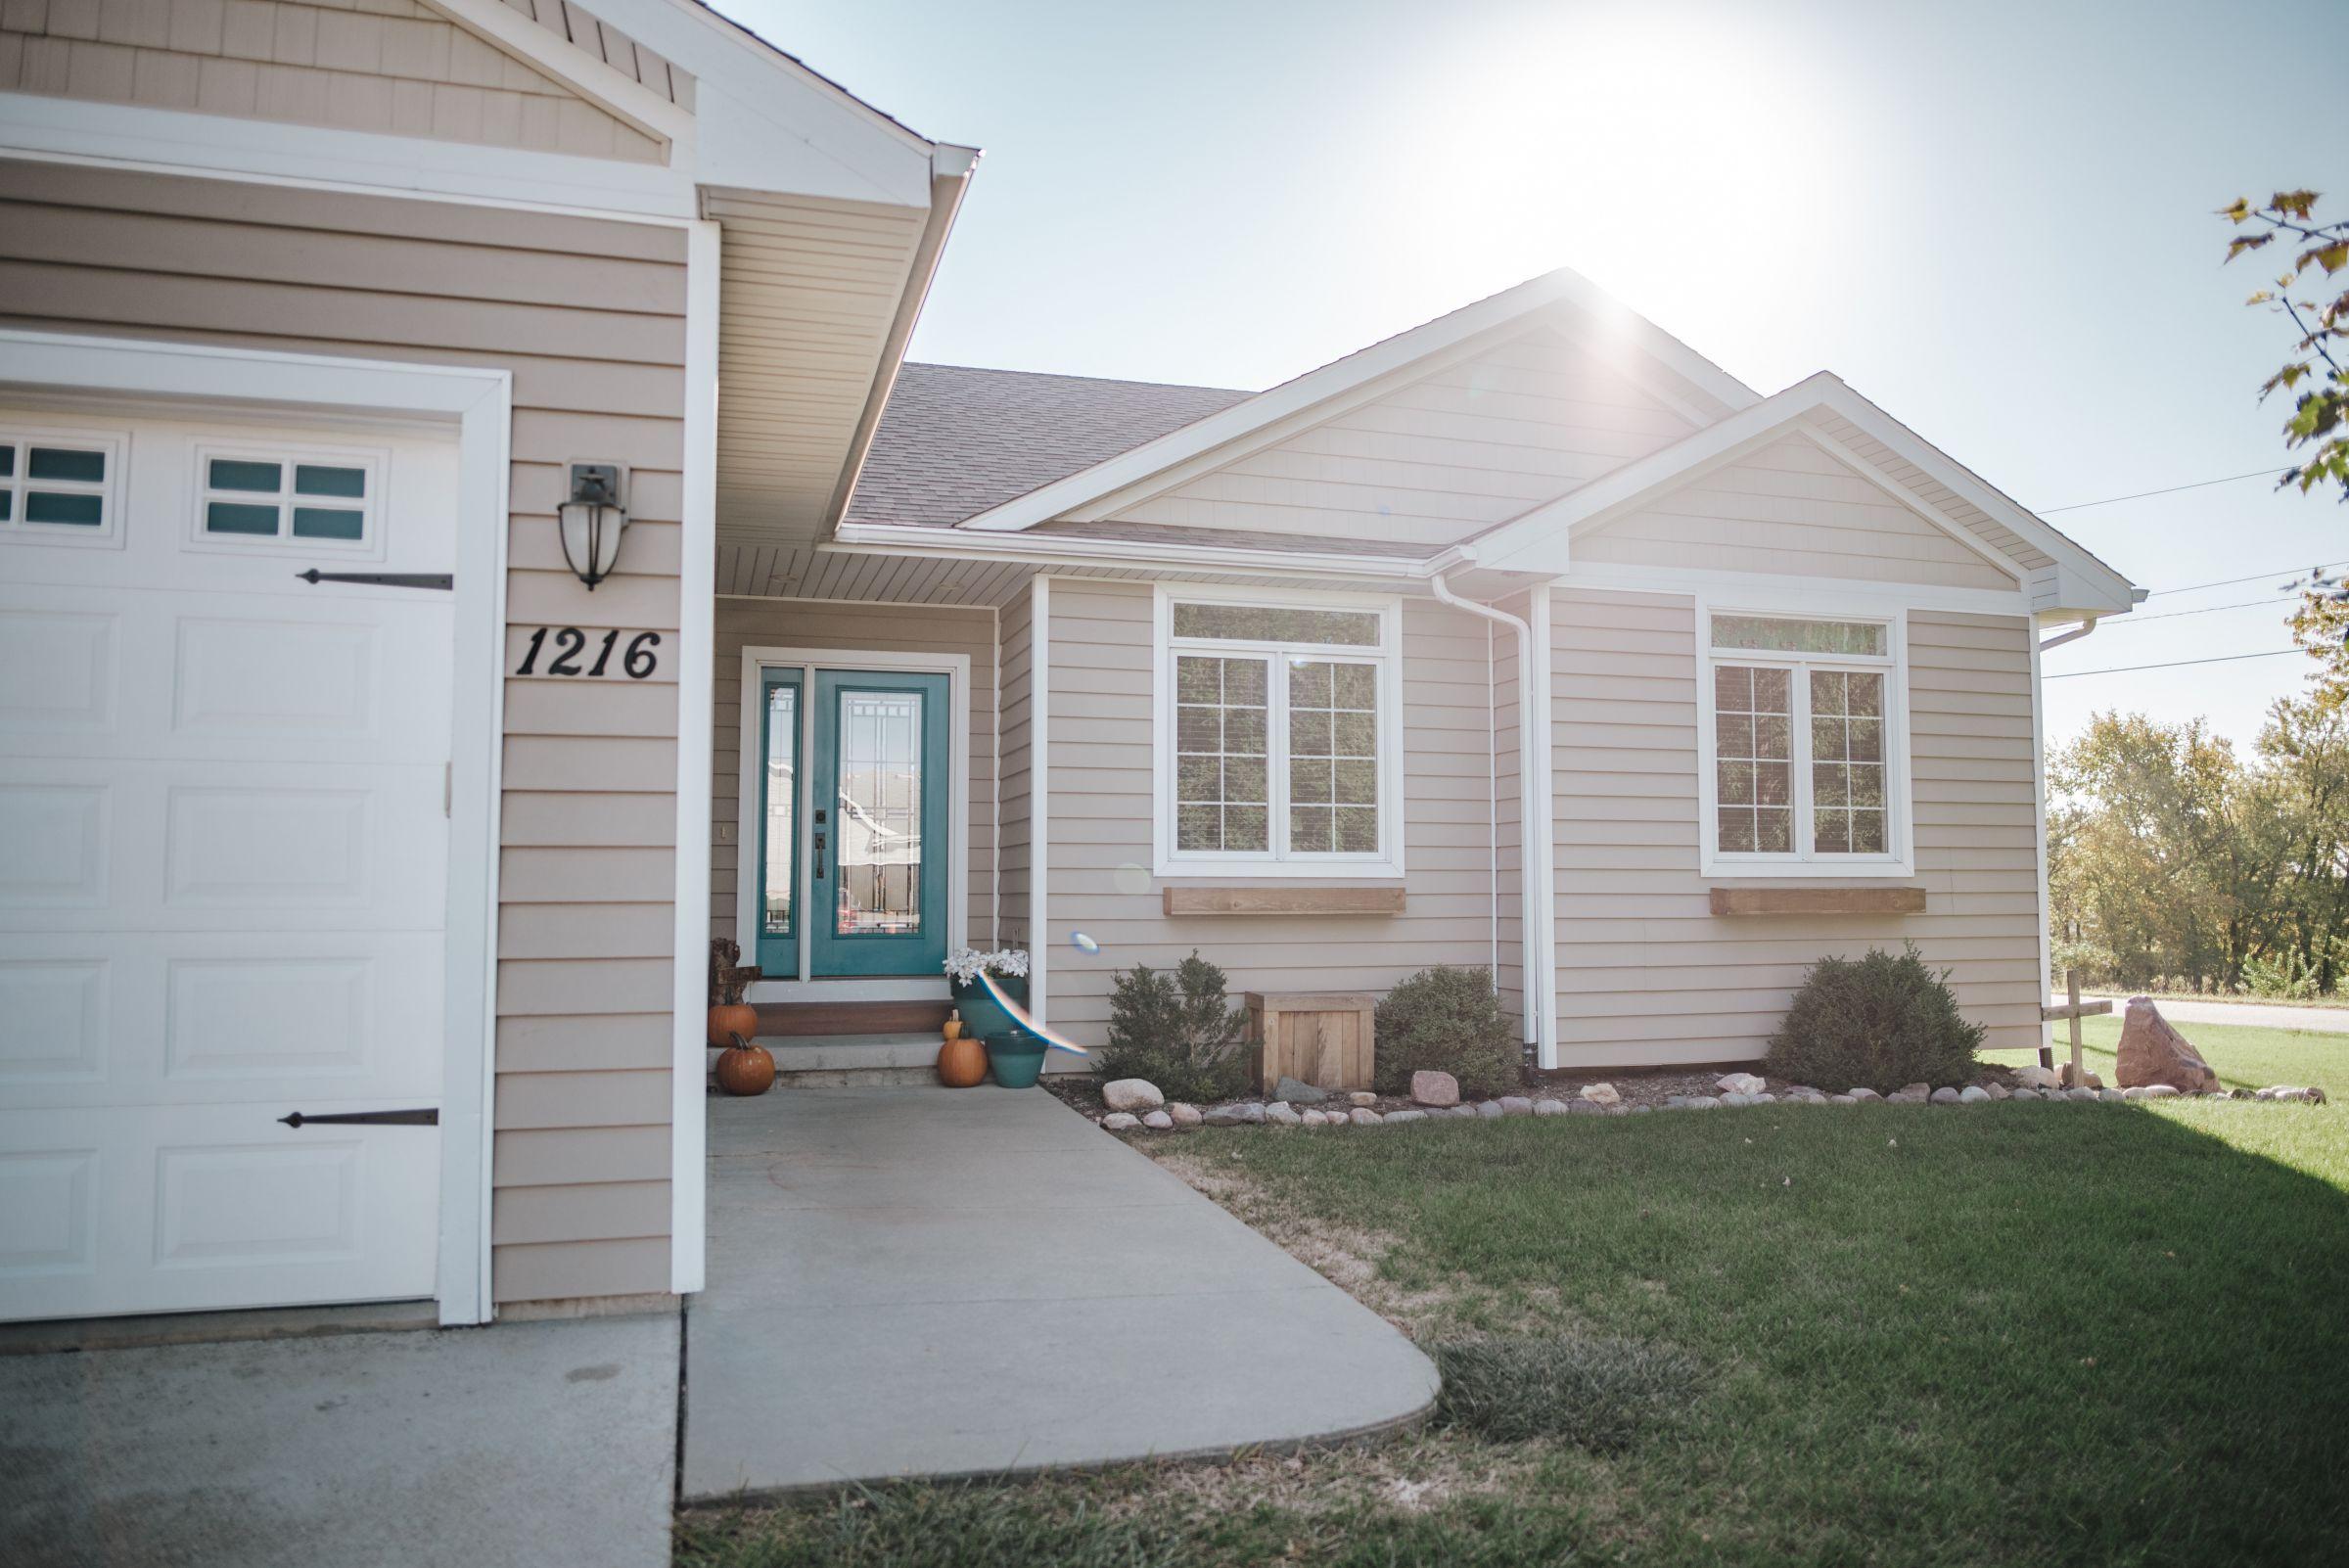 residential-warren-county-iowa-0-acres-listing-number-15204-3-2020-10-09-190528.jpg